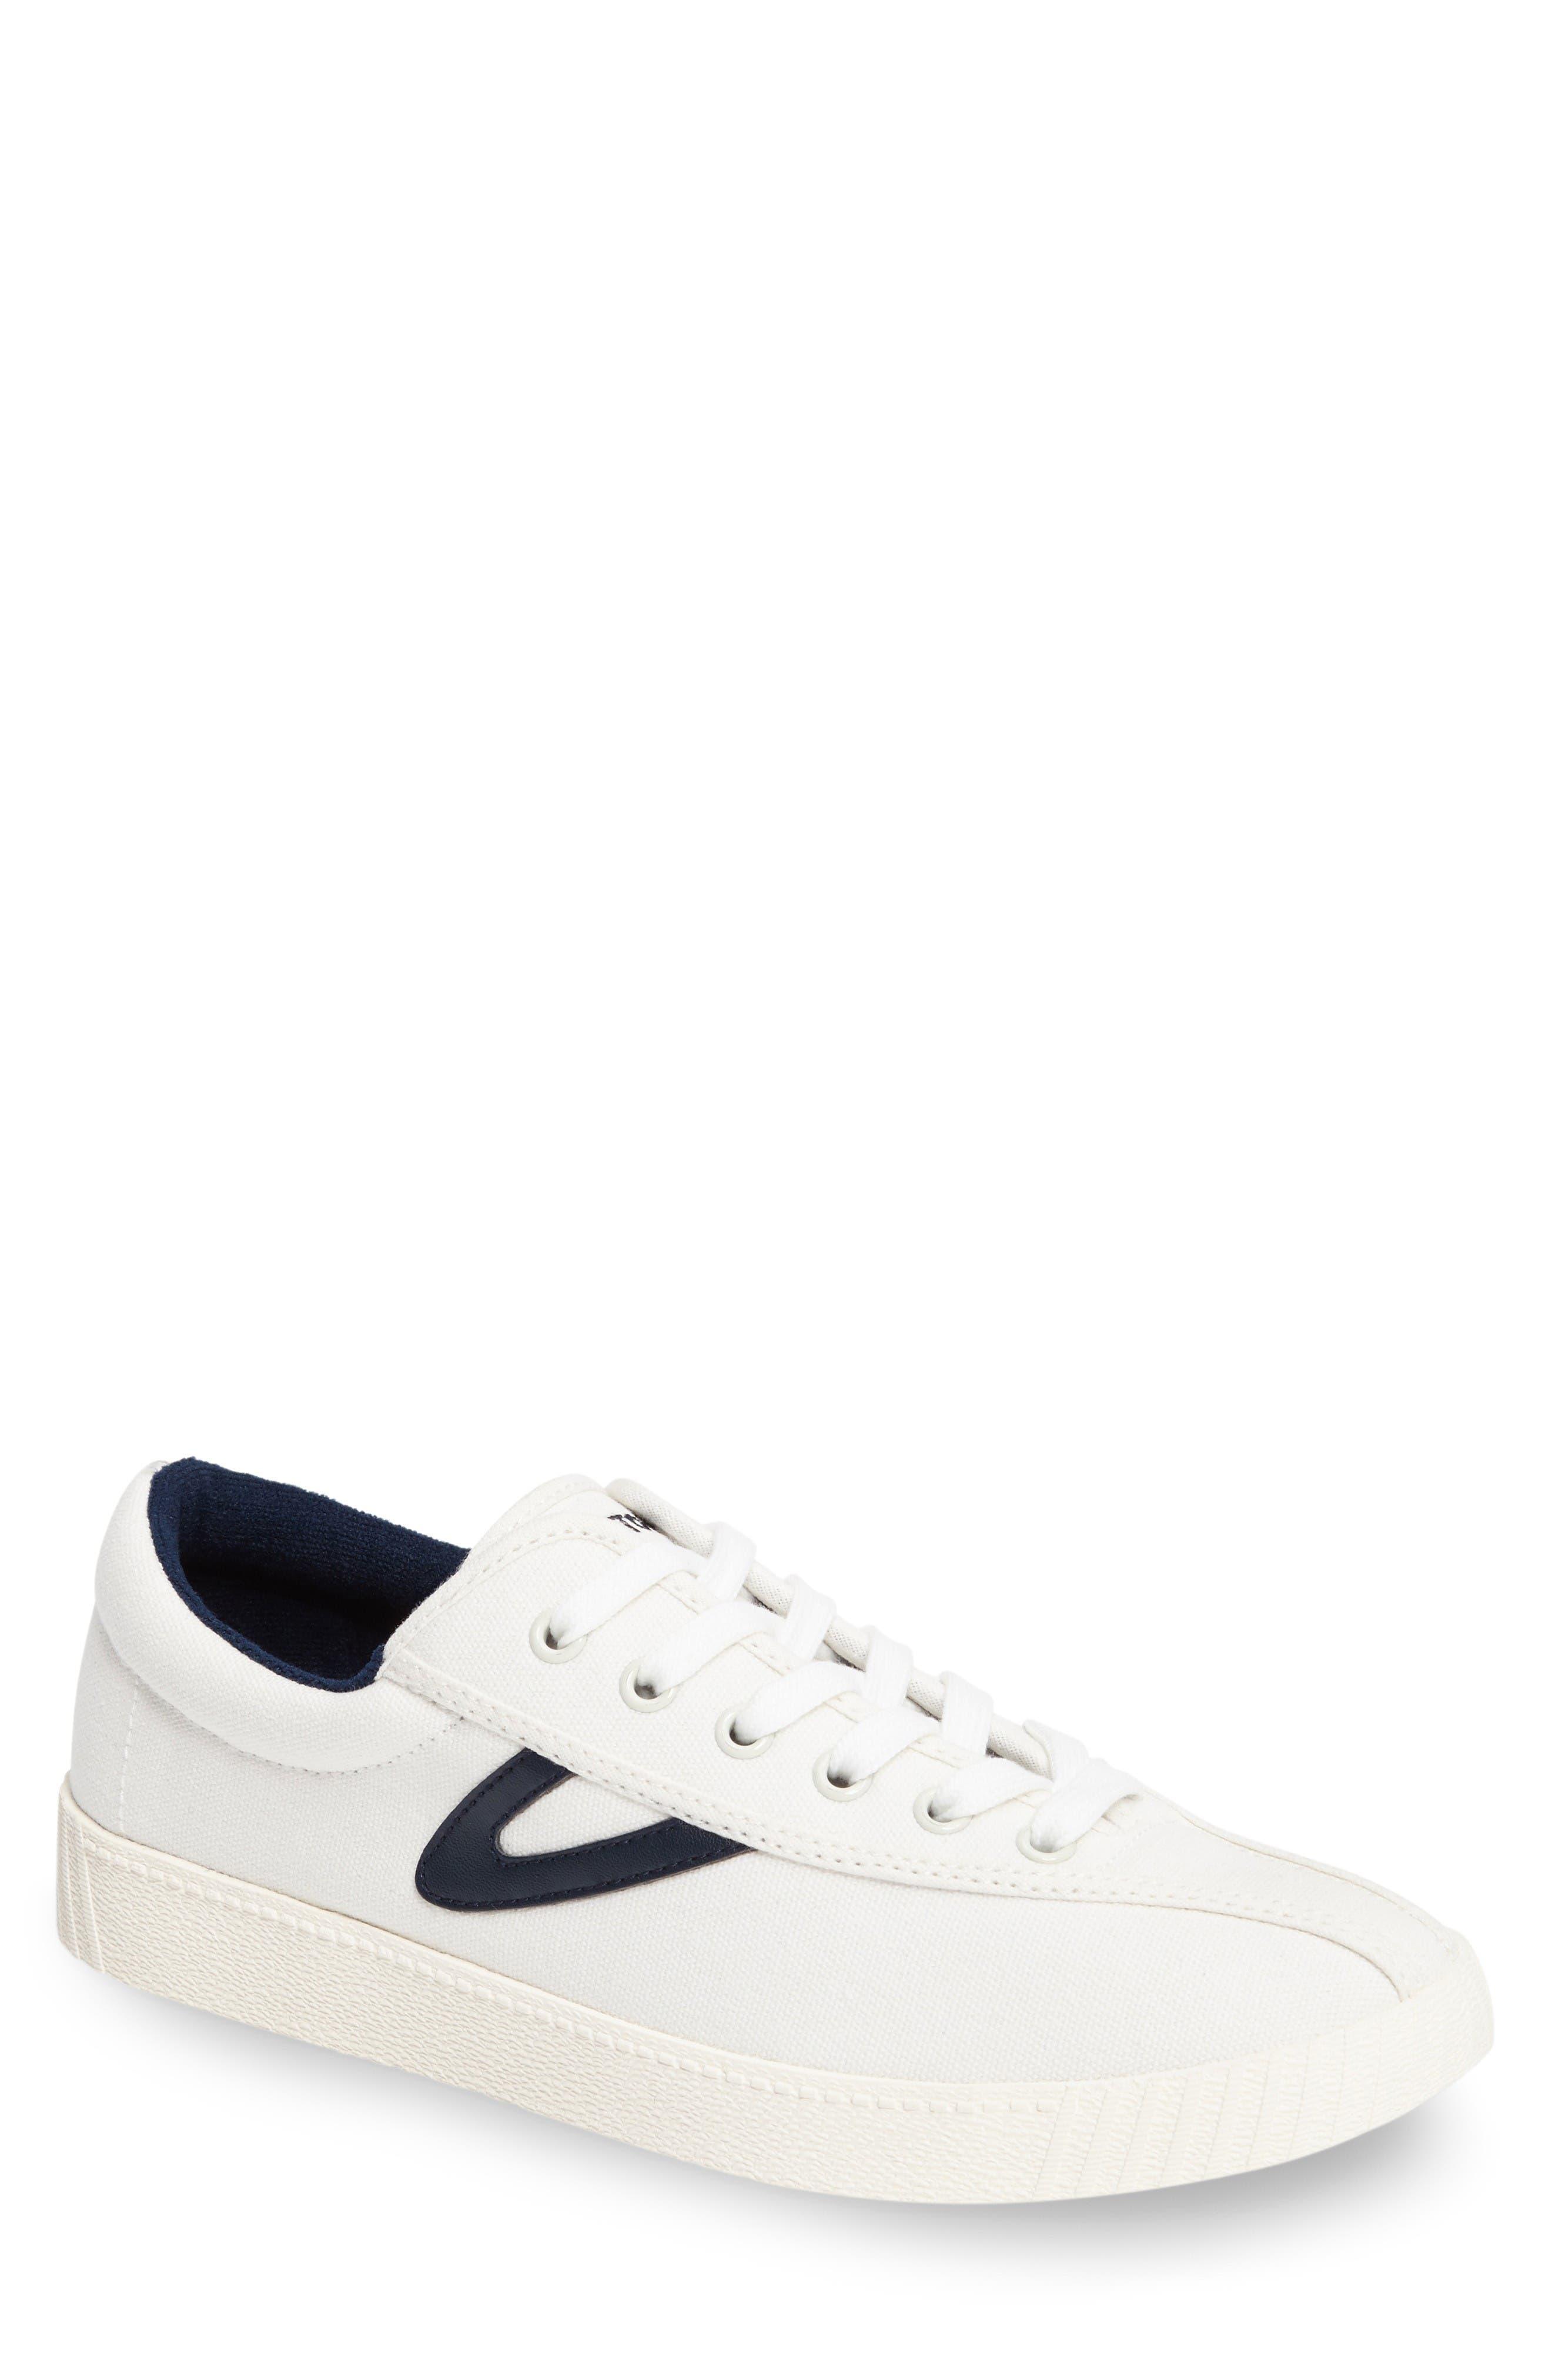 Tretorn Nylite Plus Sneaker (Men)